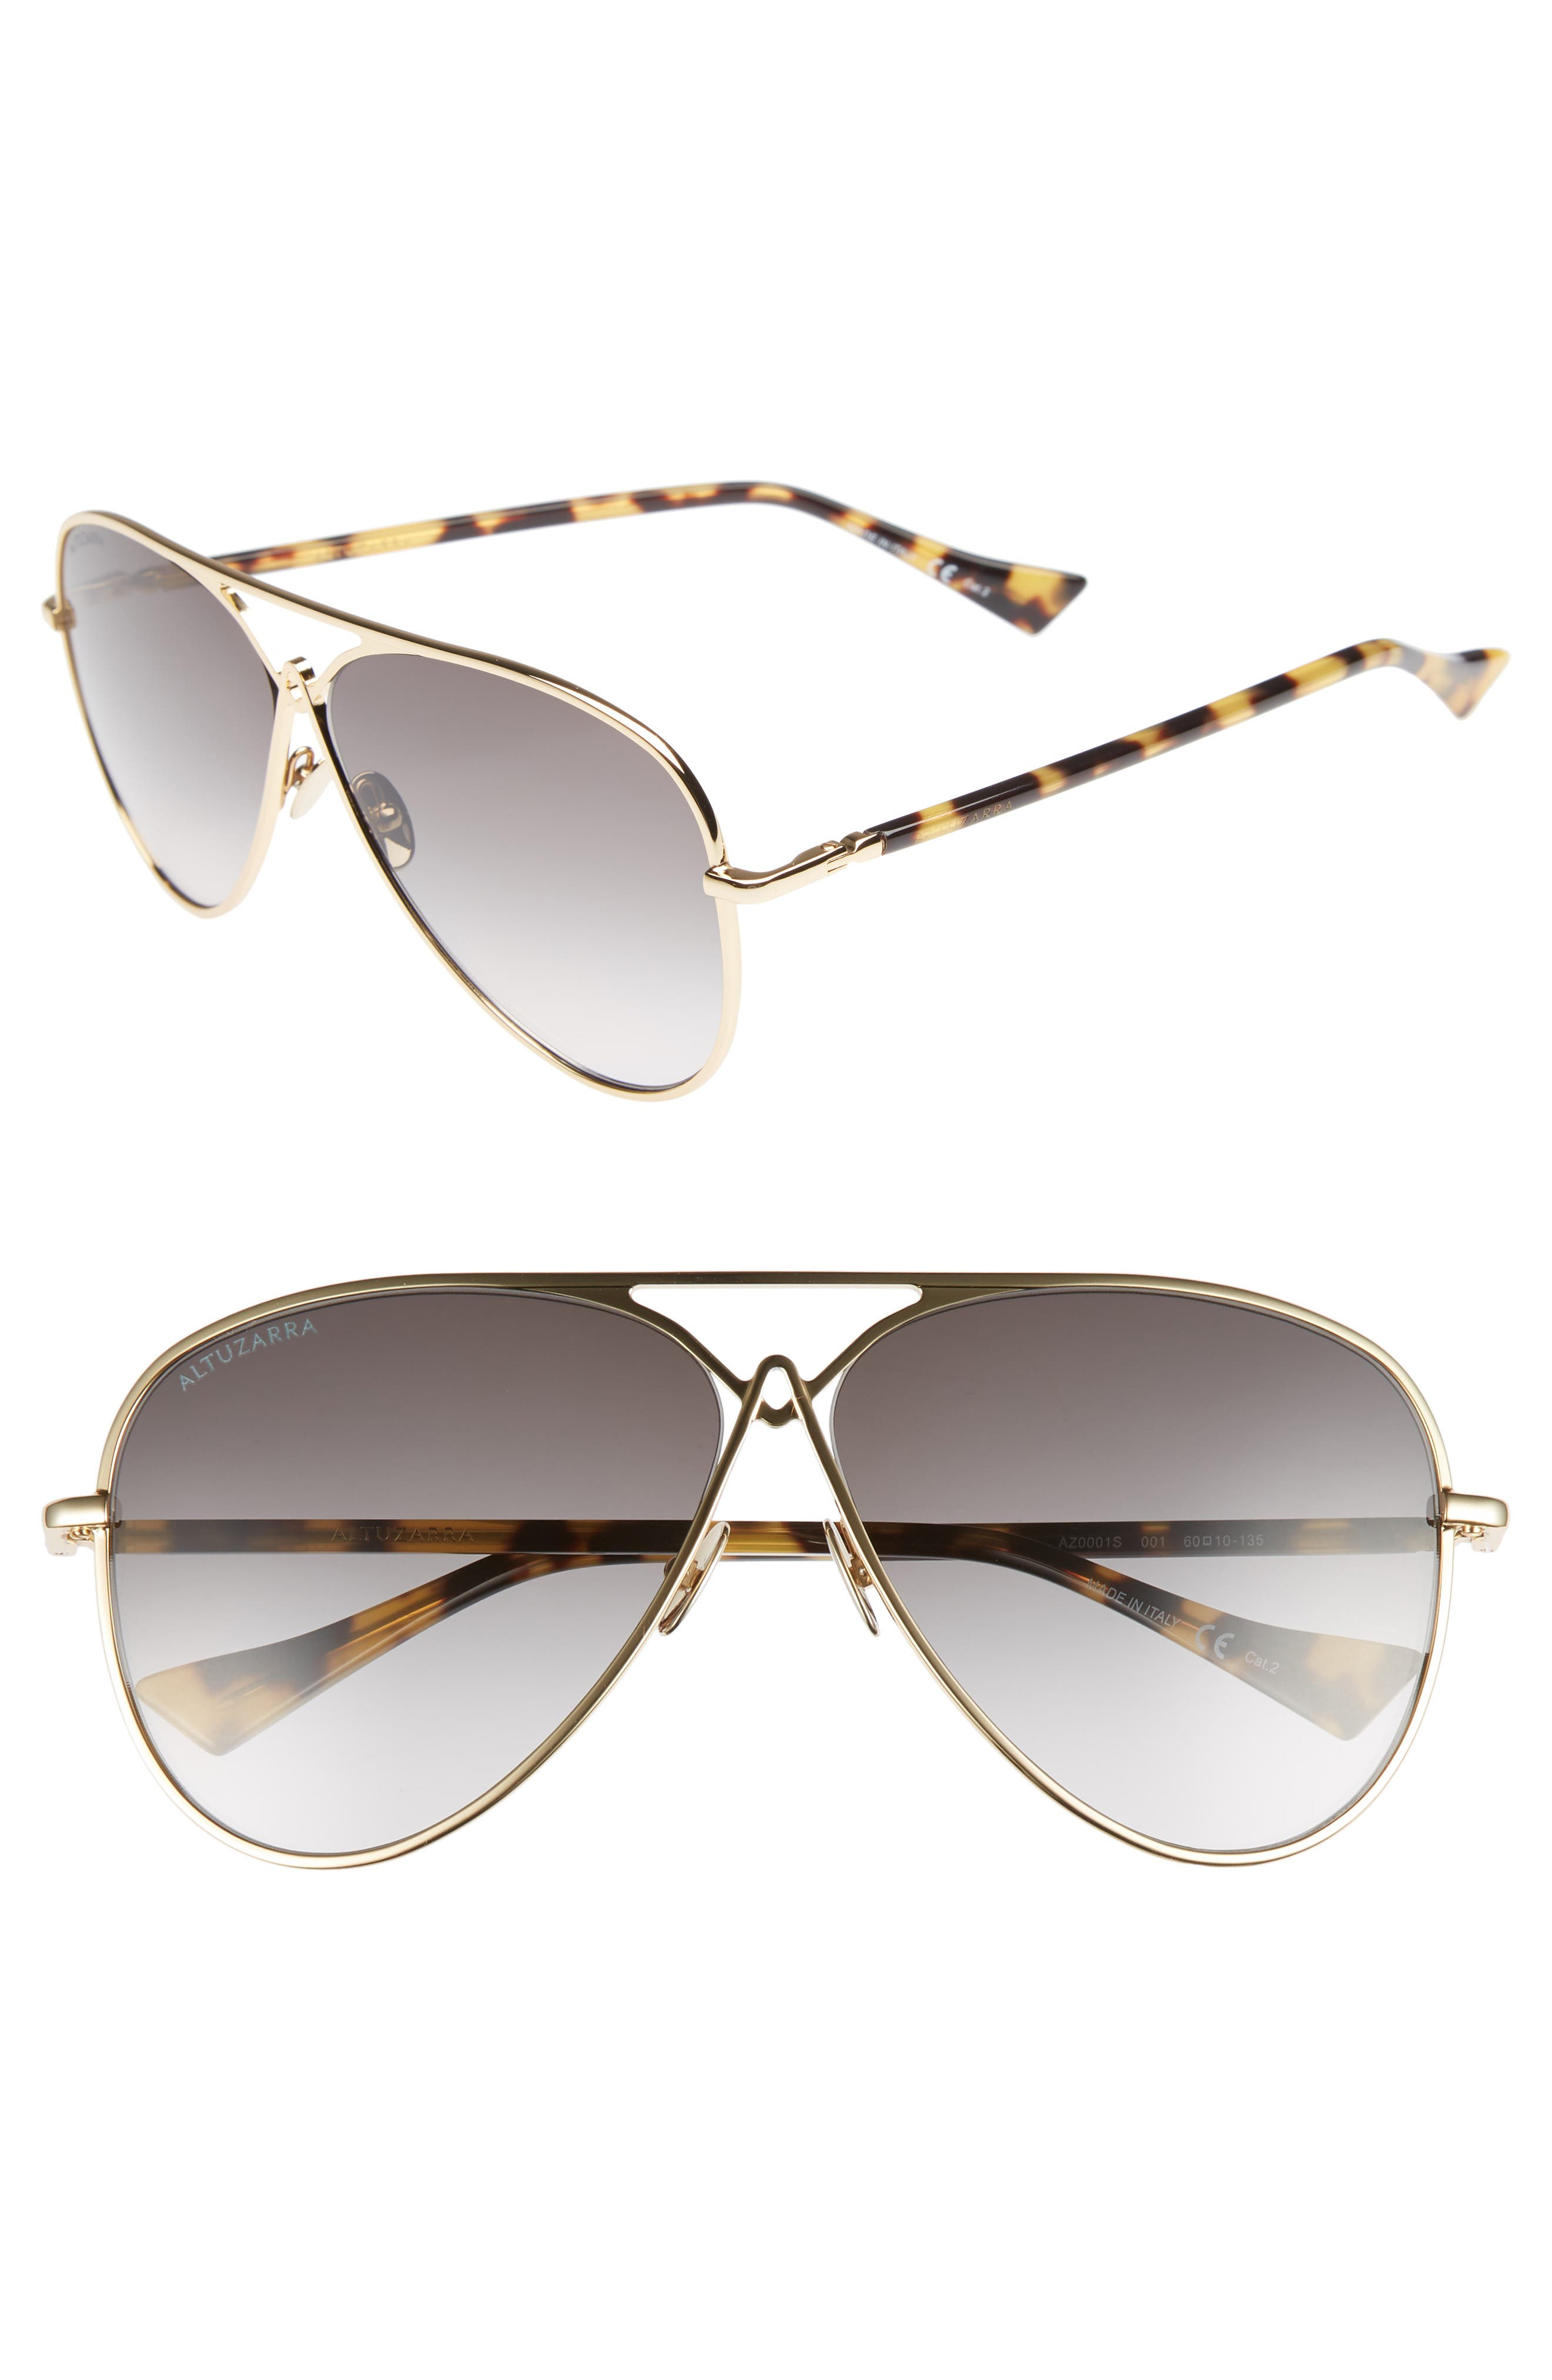 60mm Metal Aviator Sunglasses,                             Main thumbnail 1, color,                             Gold